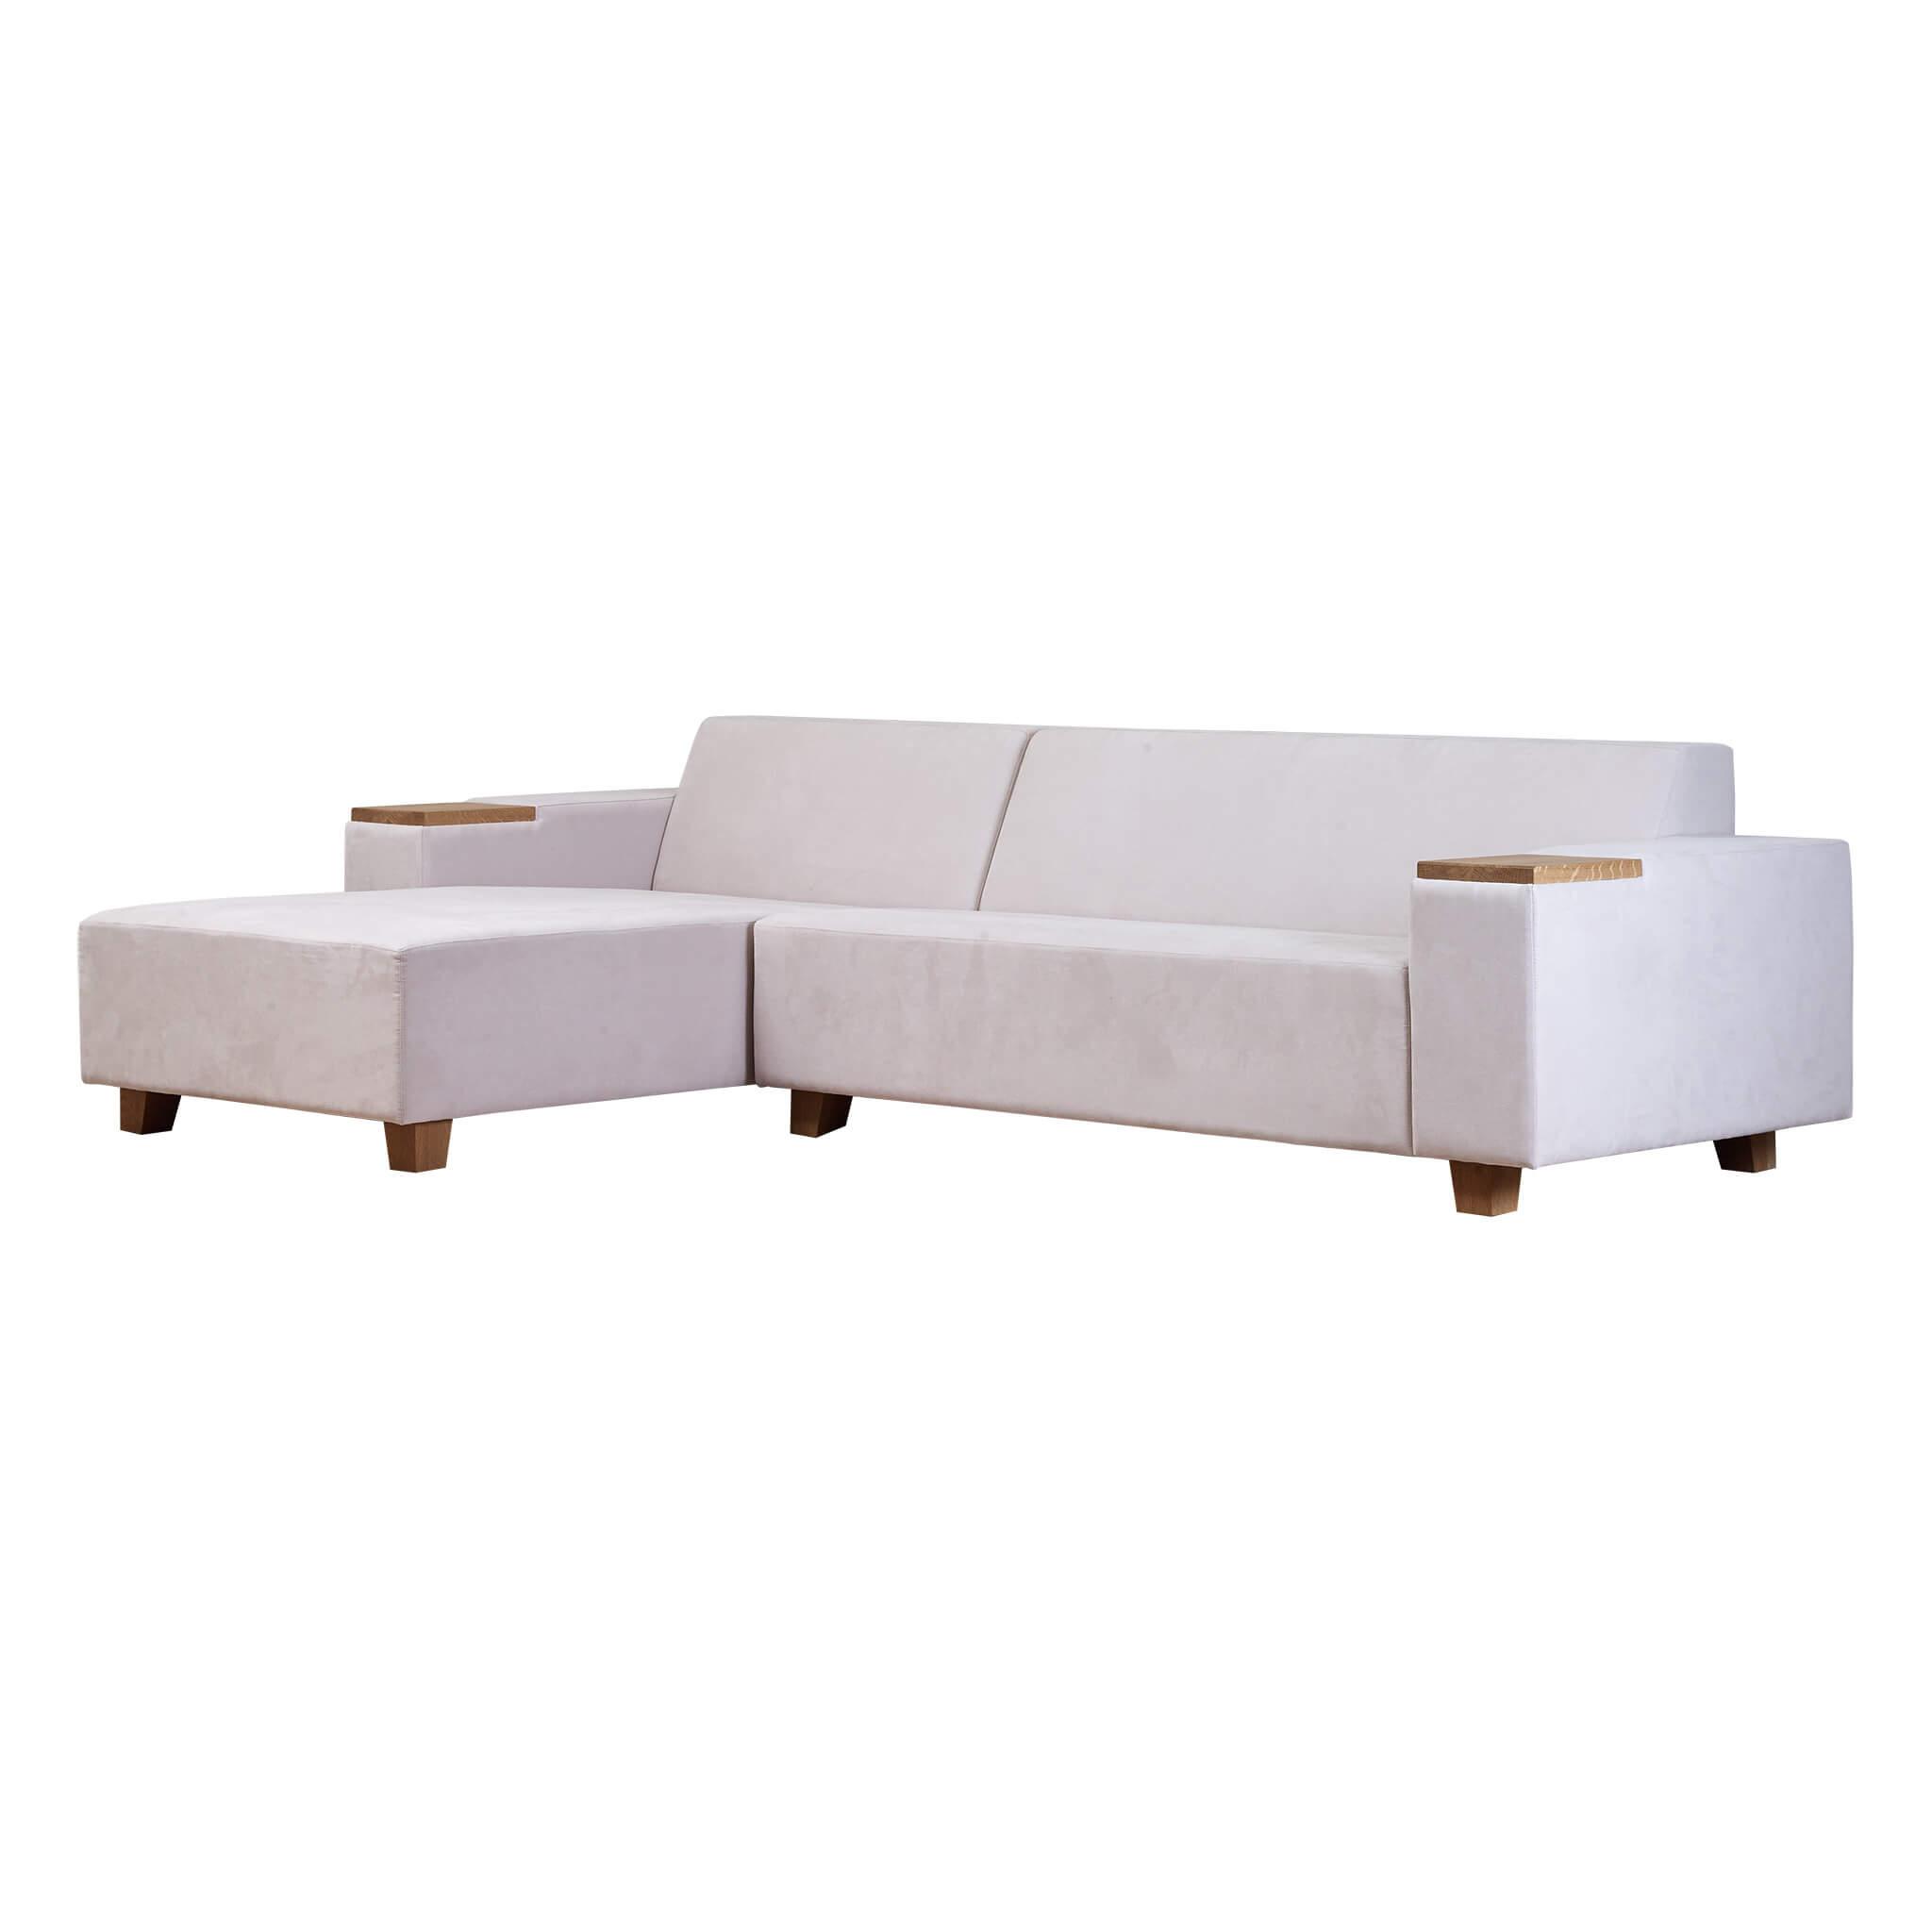 COMBO corner sofa